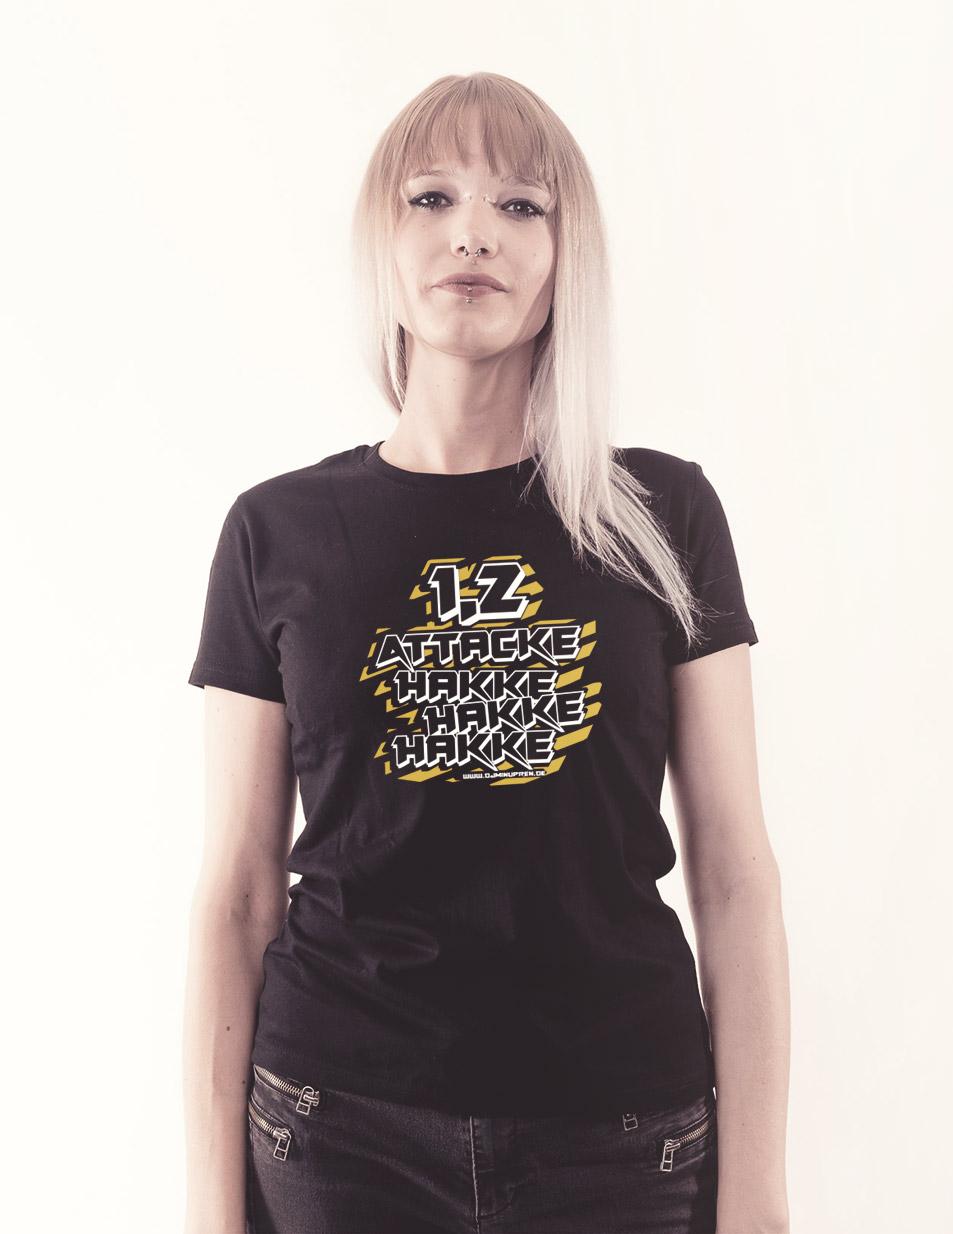 Hakke Hakke Hakke Girly T-Shirt mehrfarbig auf schwarz